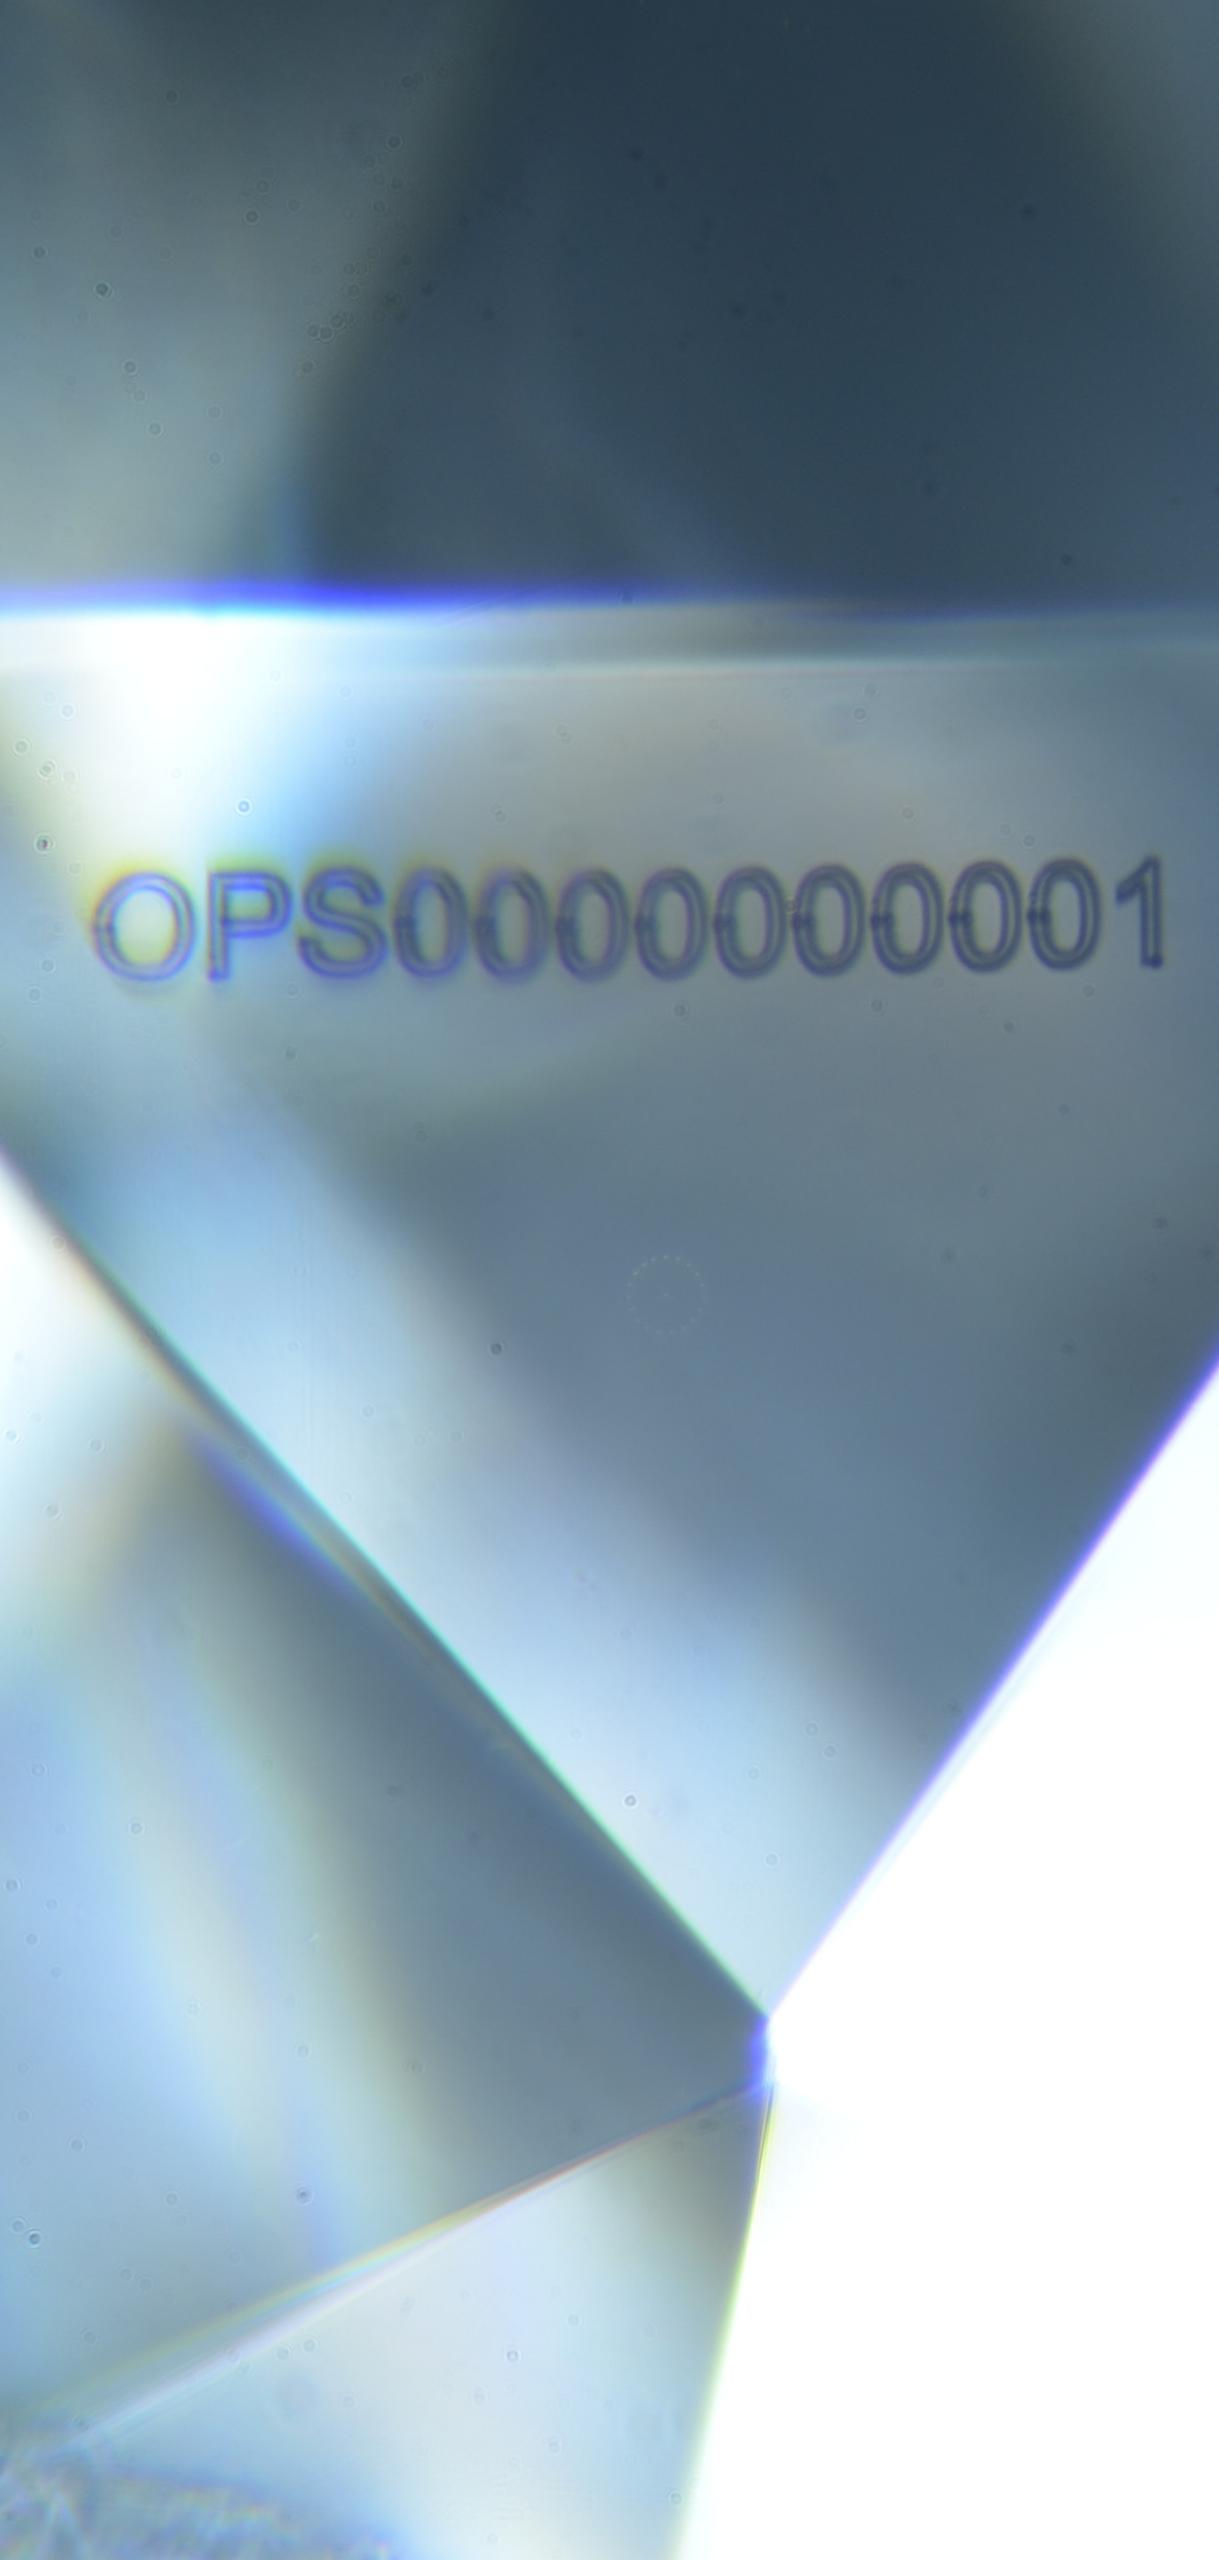 Opsydia alphanumeric Loupe ID beneath the surface of a diamond